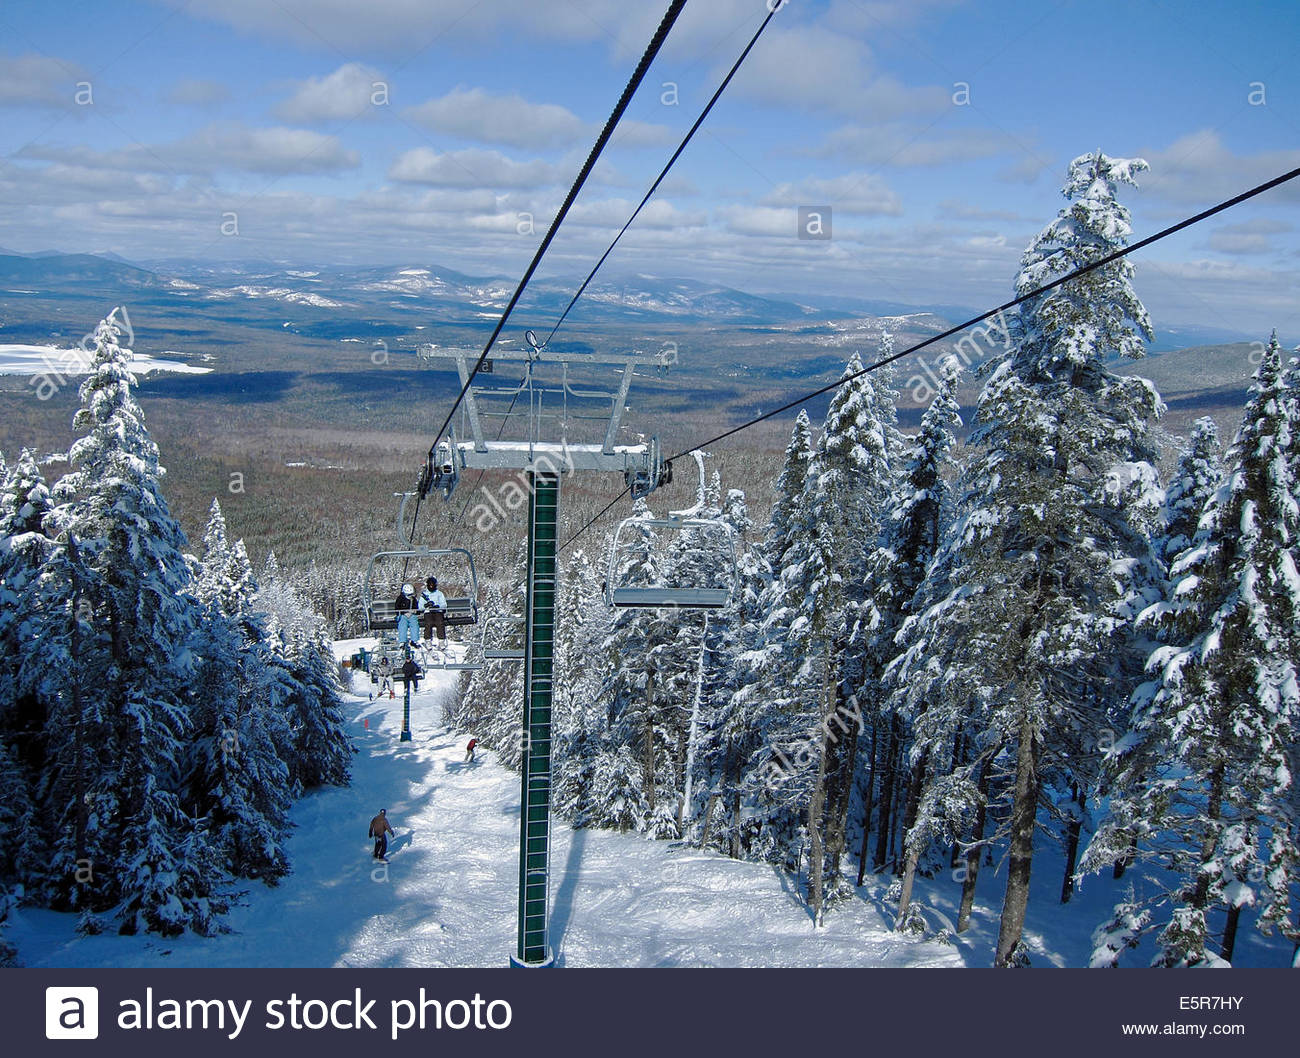 Alpine skiing at Saddleback Mountain in Sandy River Plantation, Maine, USA - Stock Image